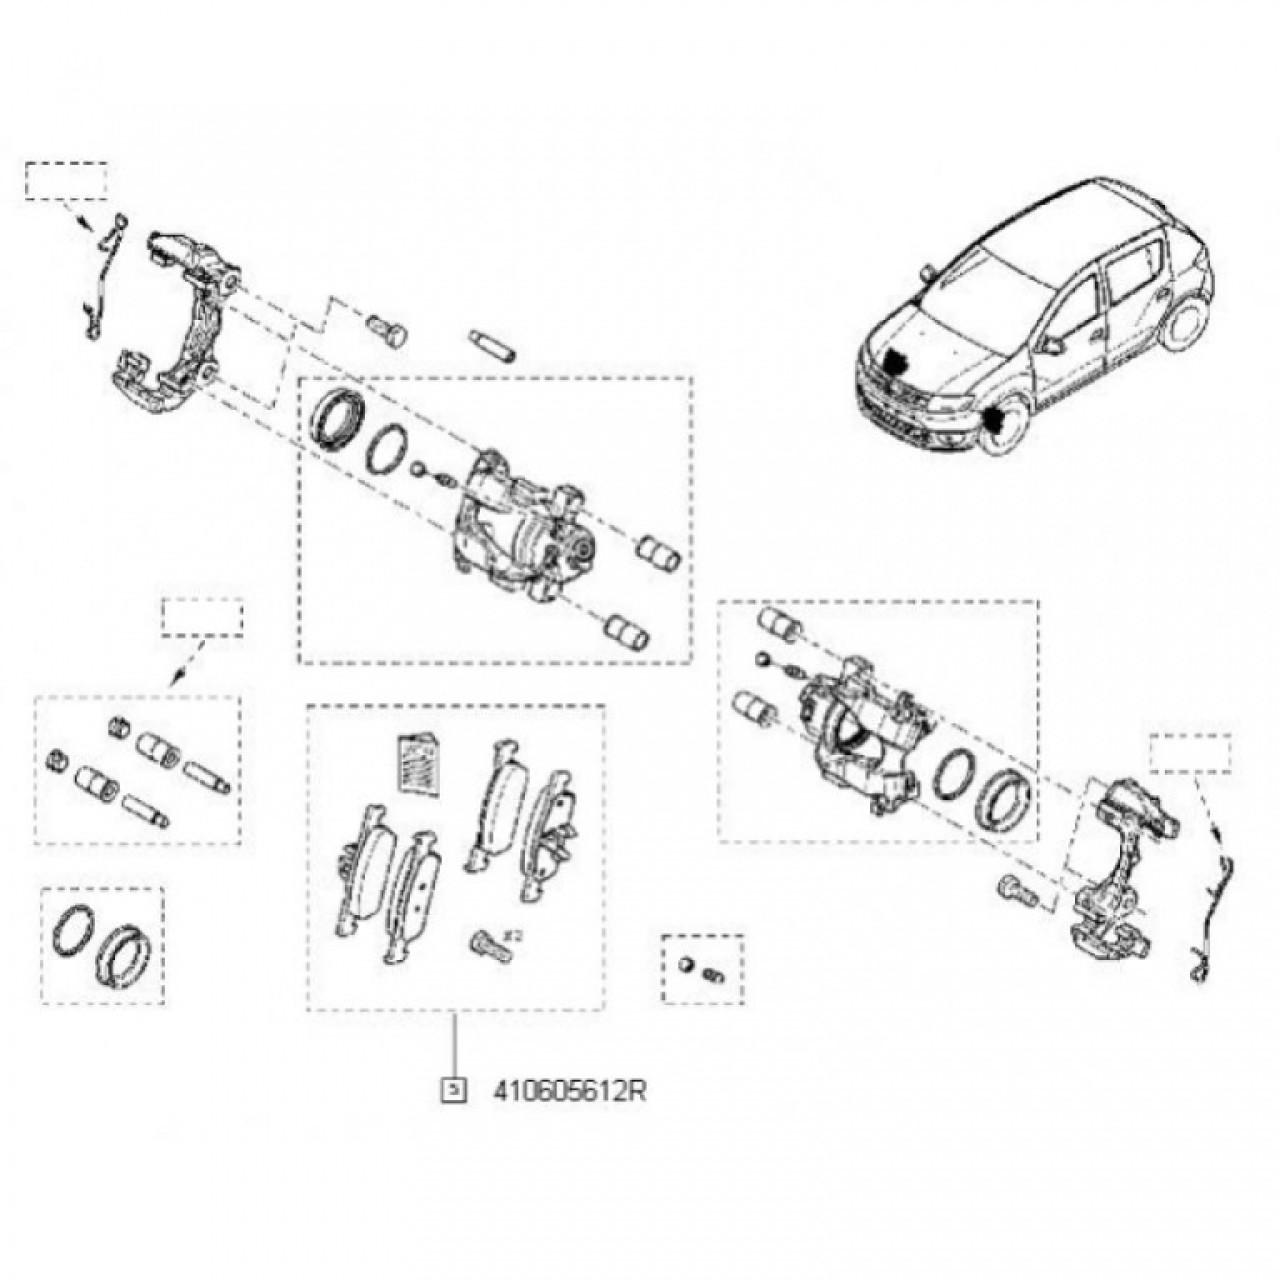 Set Placute Frana Dacia Logan 2 R